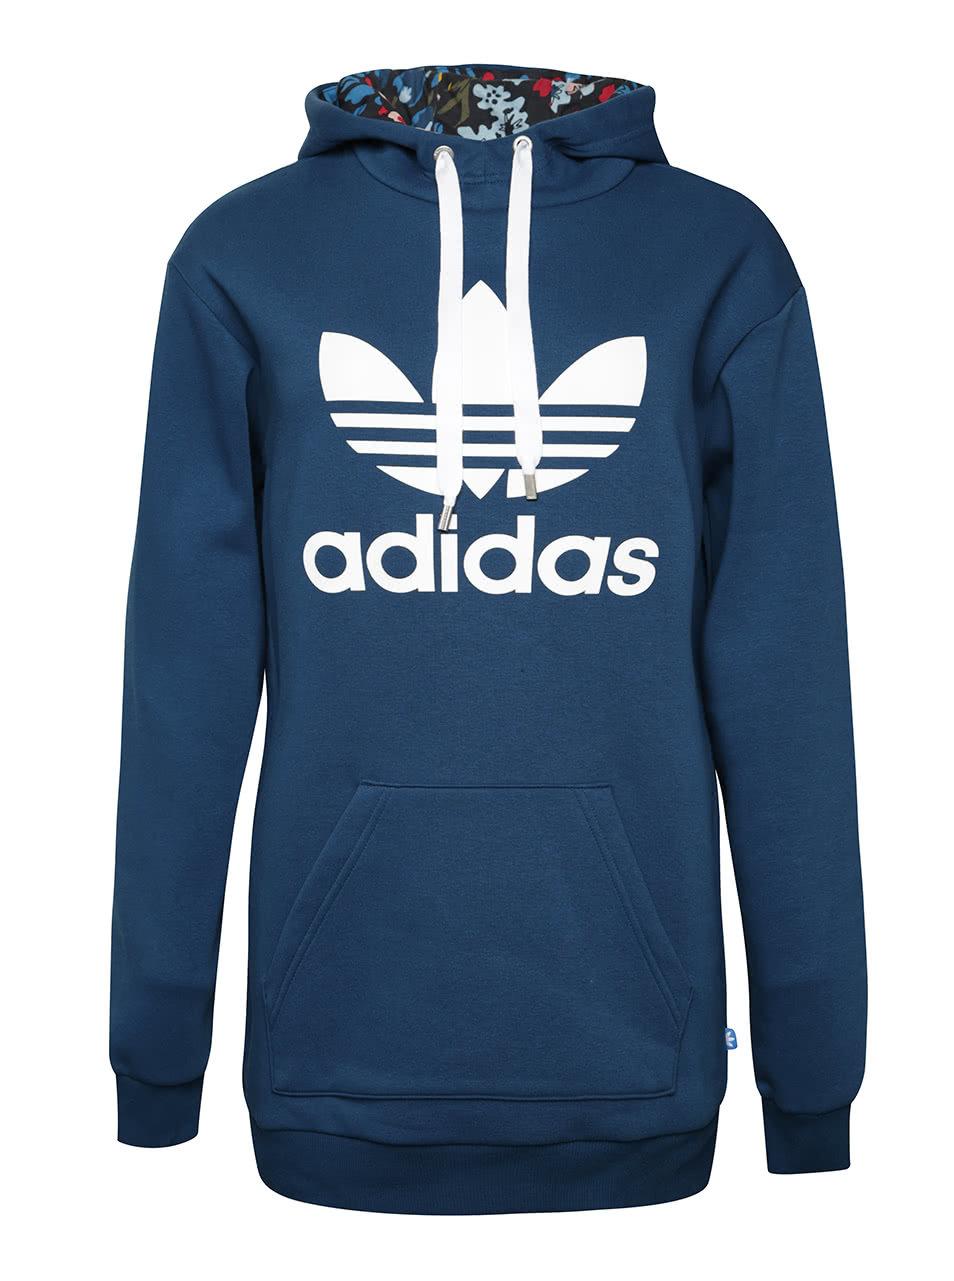 fca05c014b Modrá dámska dlhšia mikina s kapucňou adidas Originals ...